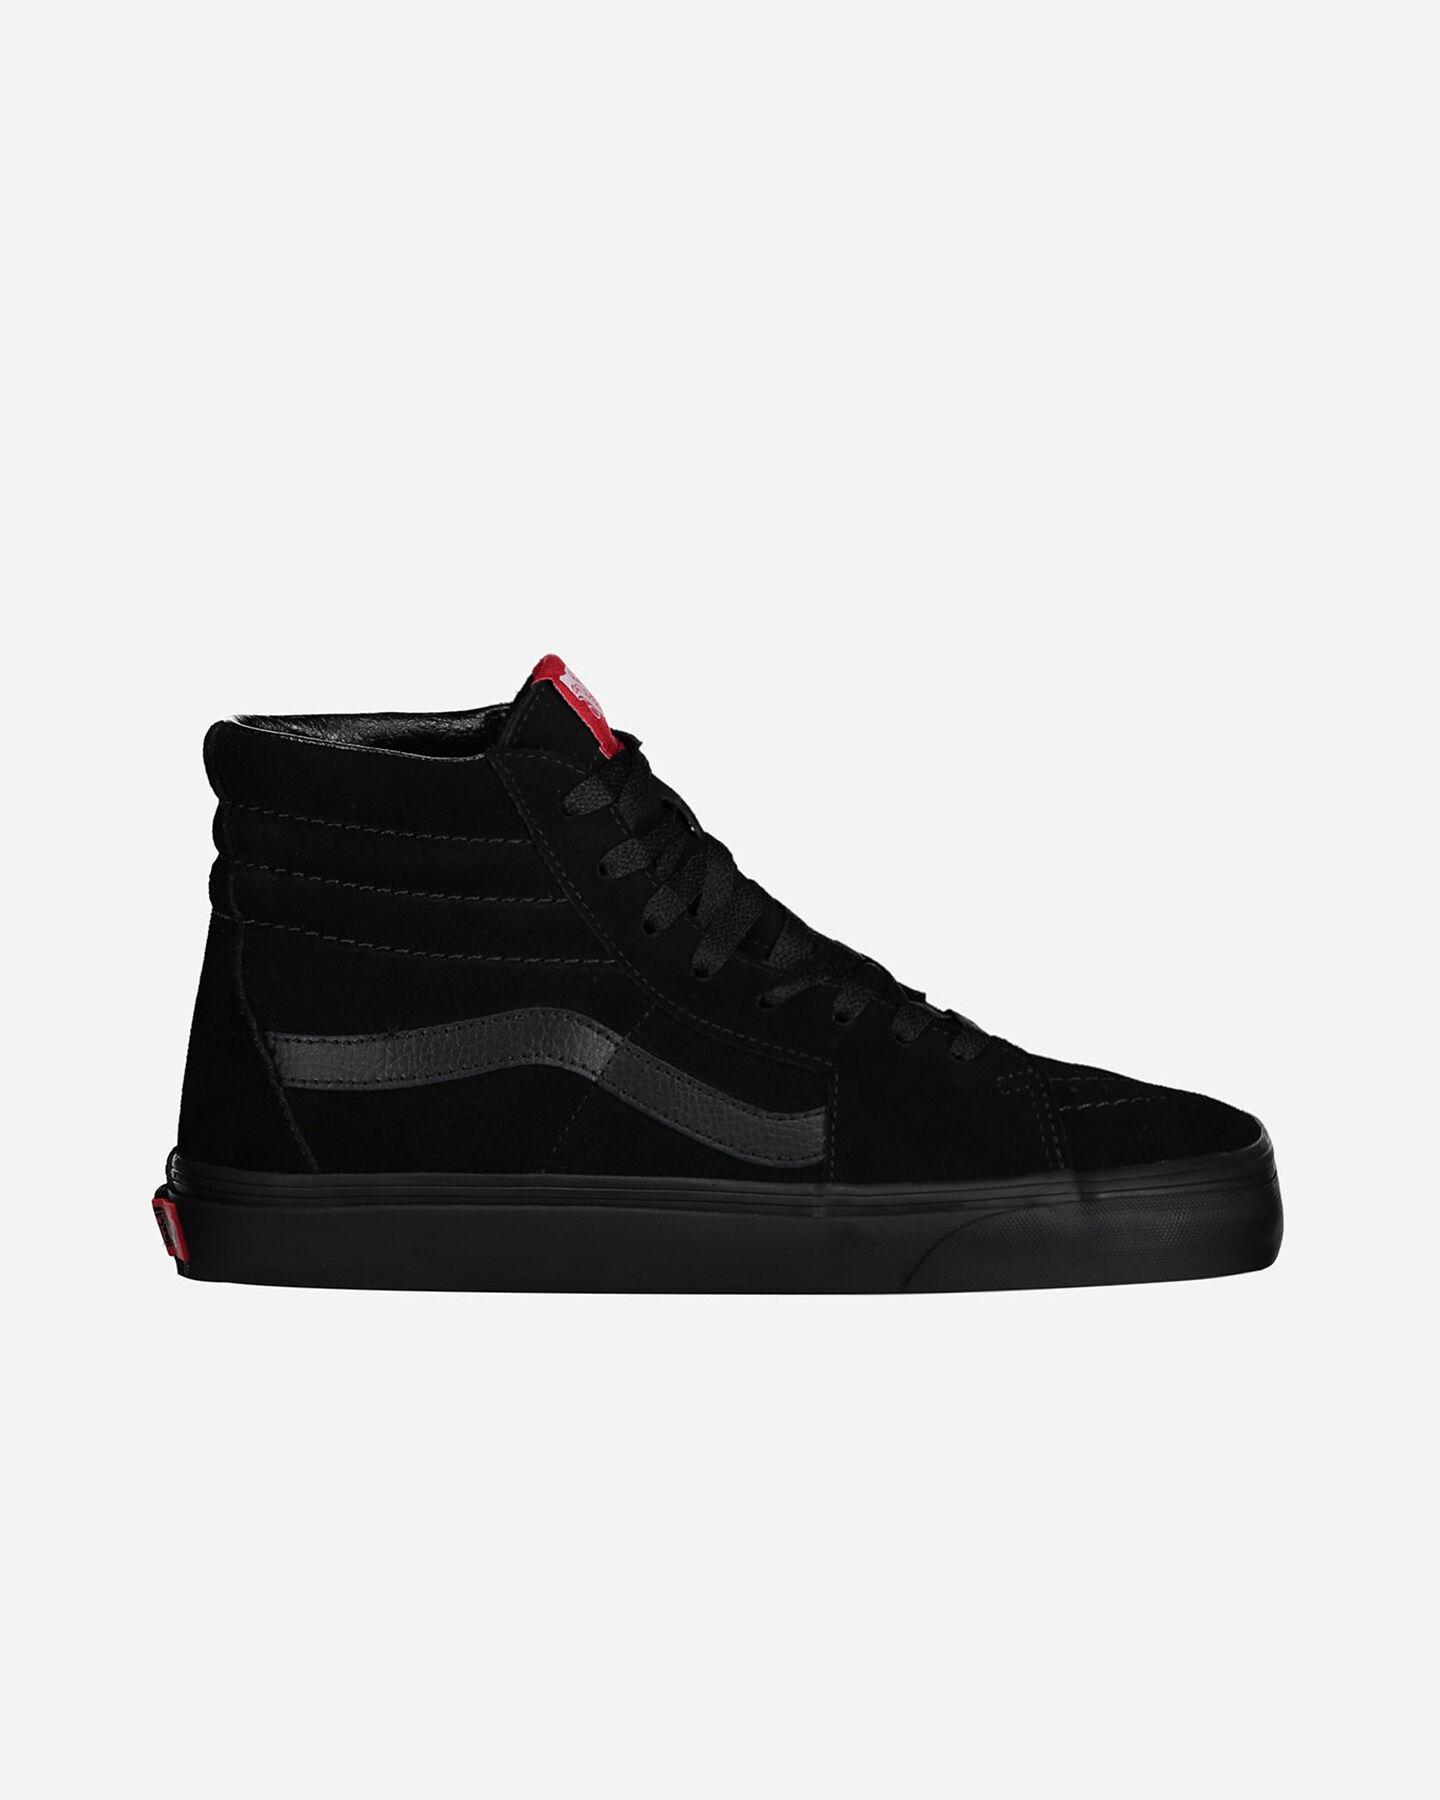 Vn000d5ibka1 Su Sk8 Sneakers Cisalfa Sport Scarpe Hi Vans CwpXqxx